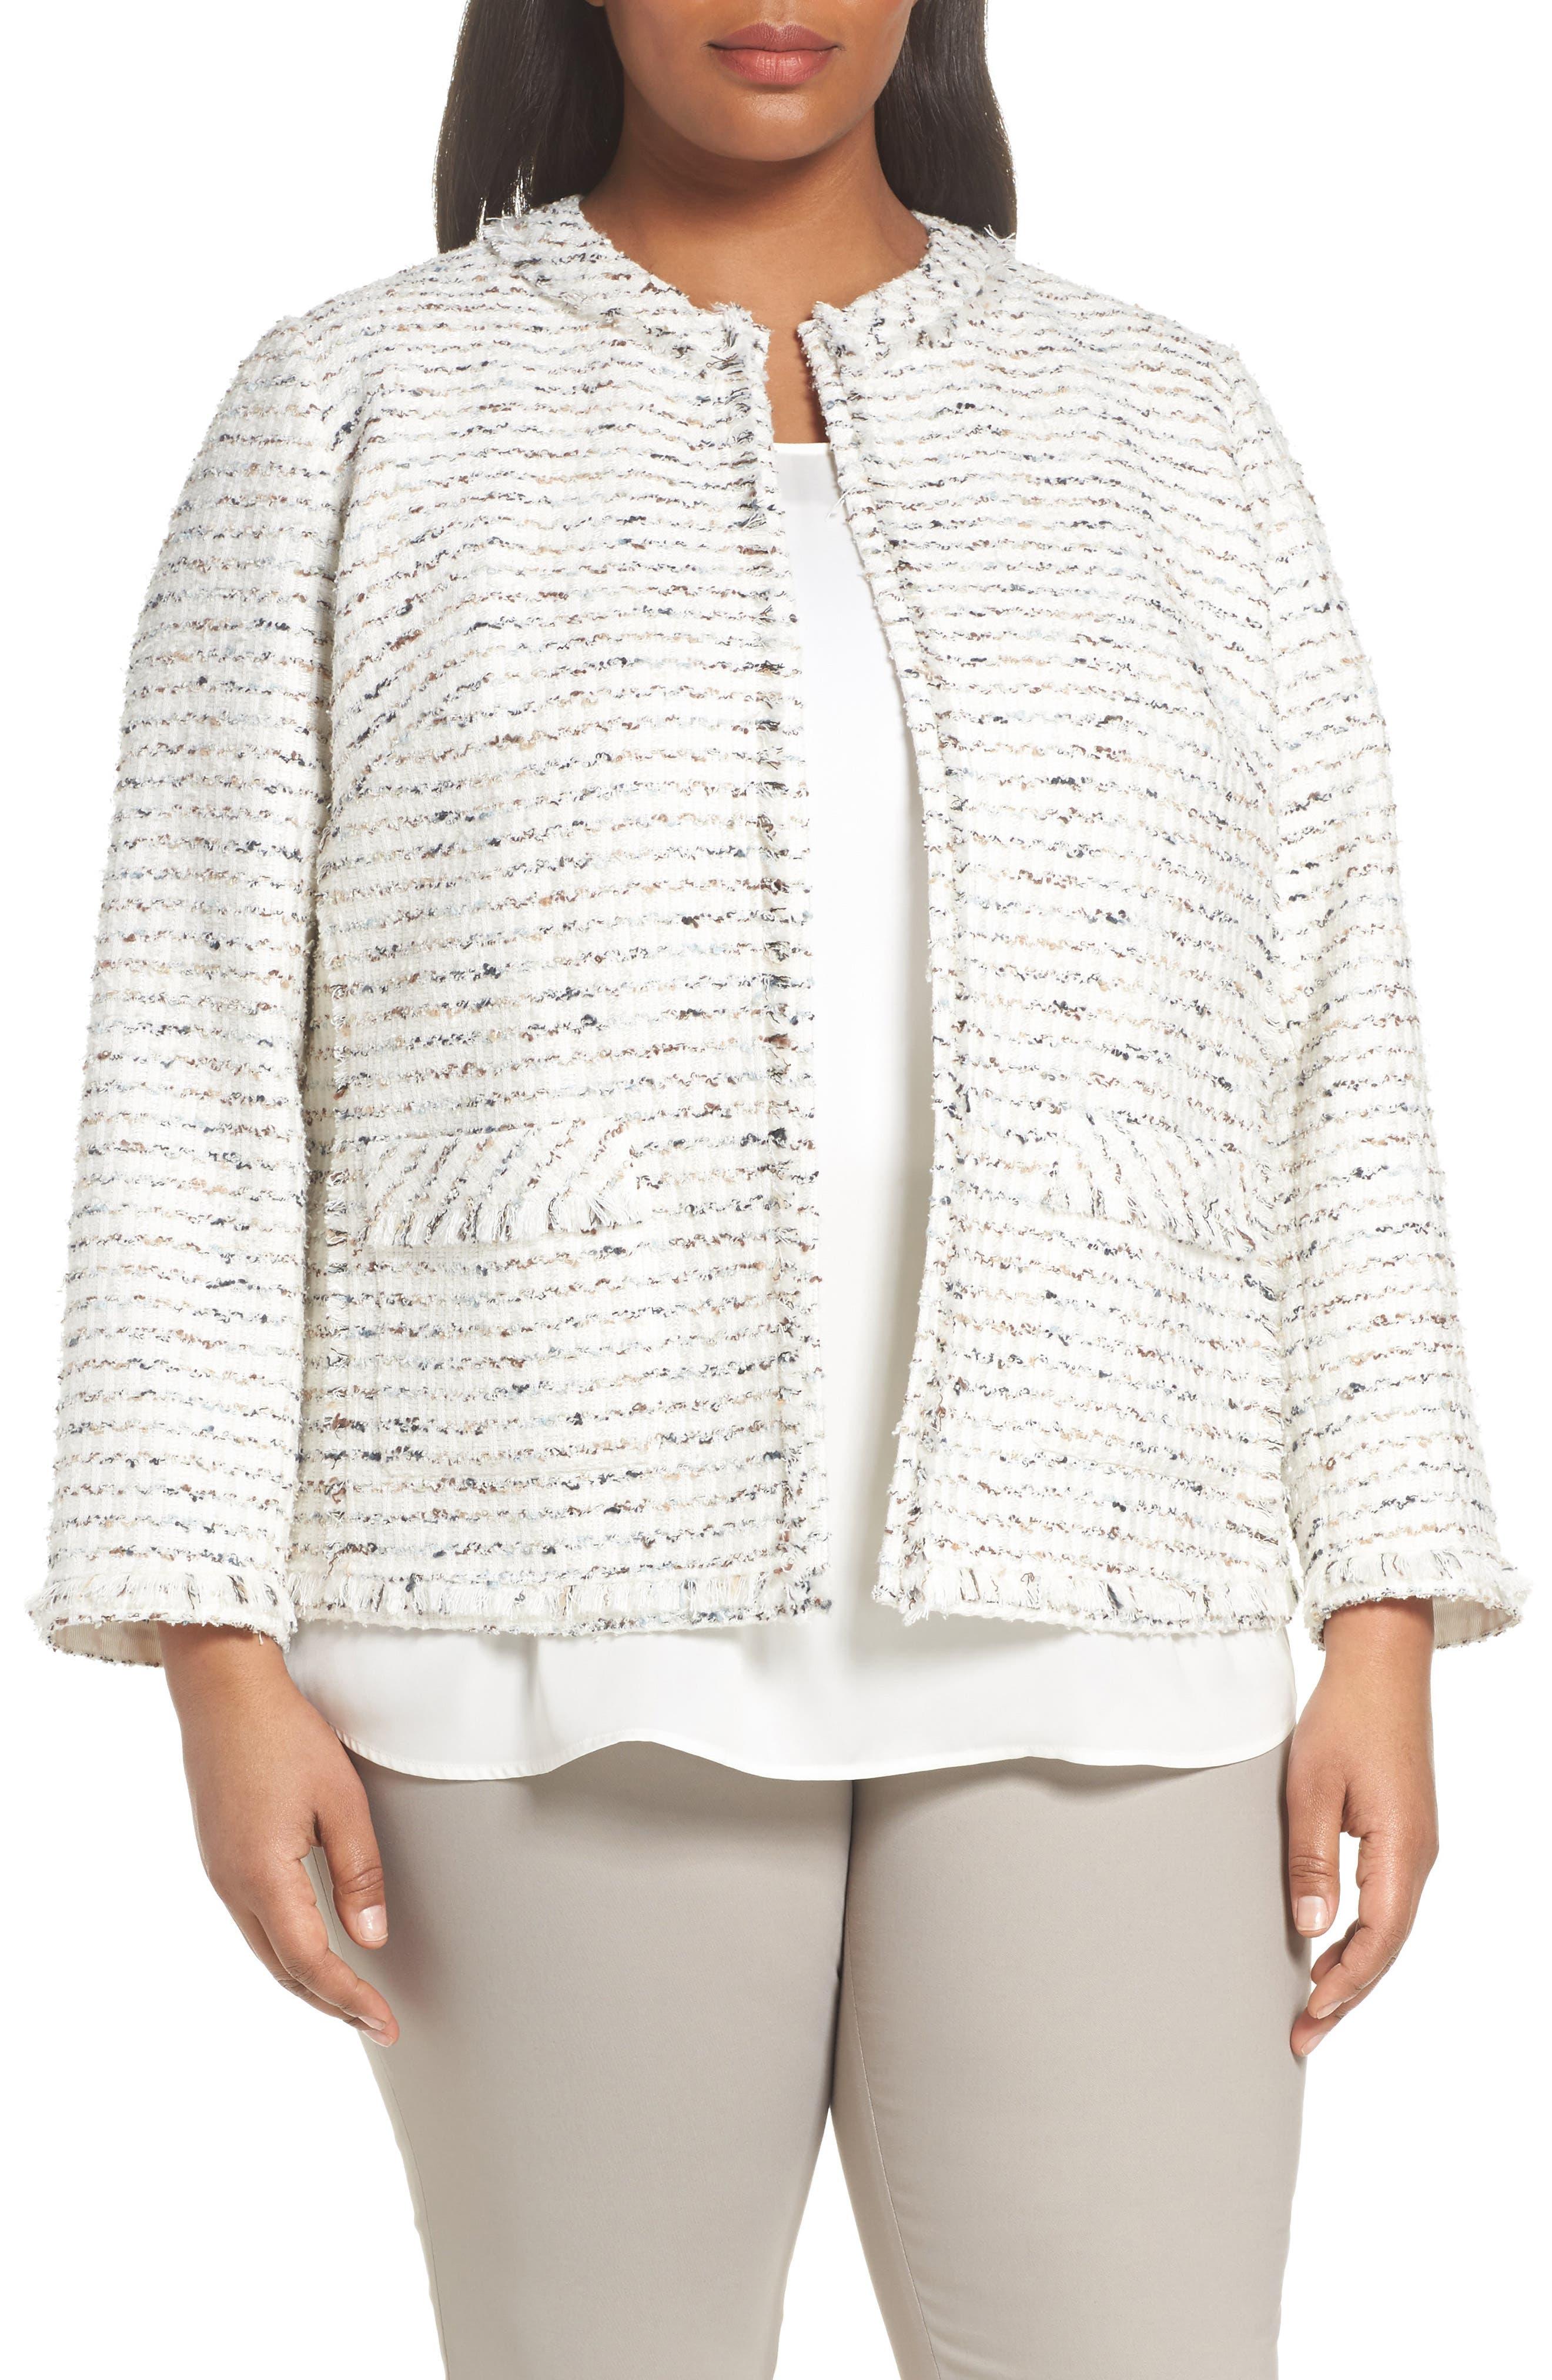 Kennedy Tweed Jacket,                             Main thumbnail 1, color,                             900